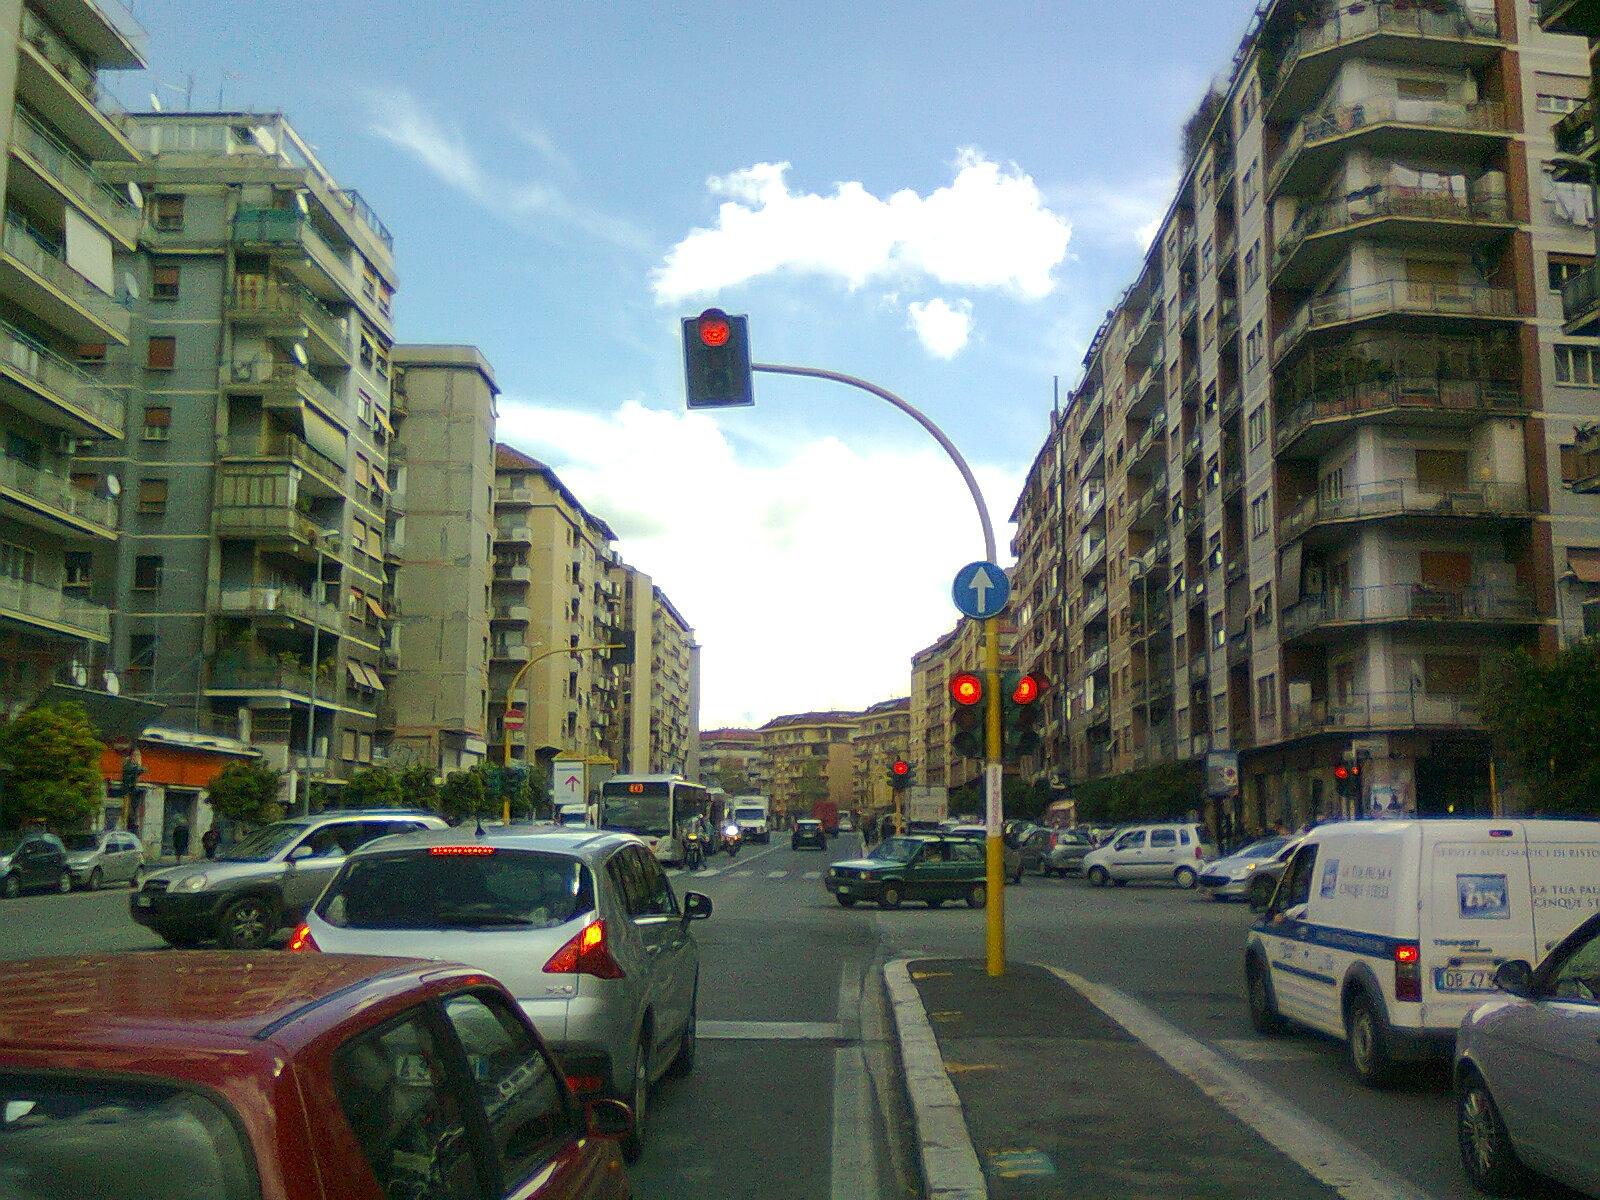 In bici per roma roma non finisce mai di stupirci torna for Binacci arredamenti via tiburtina